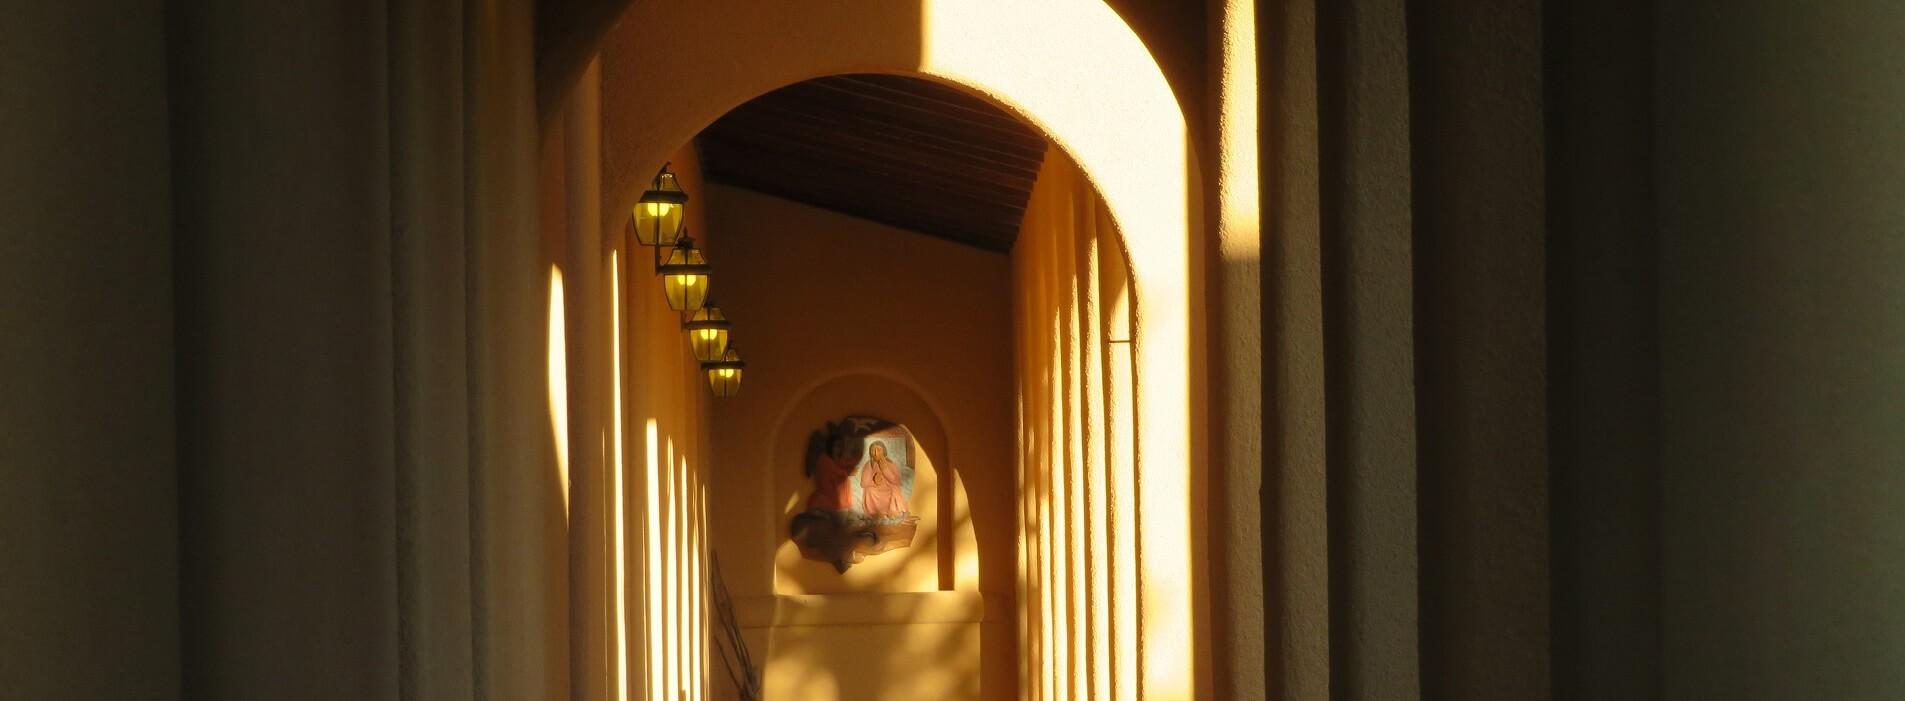 Image 5 – 2019 06e RH cloister